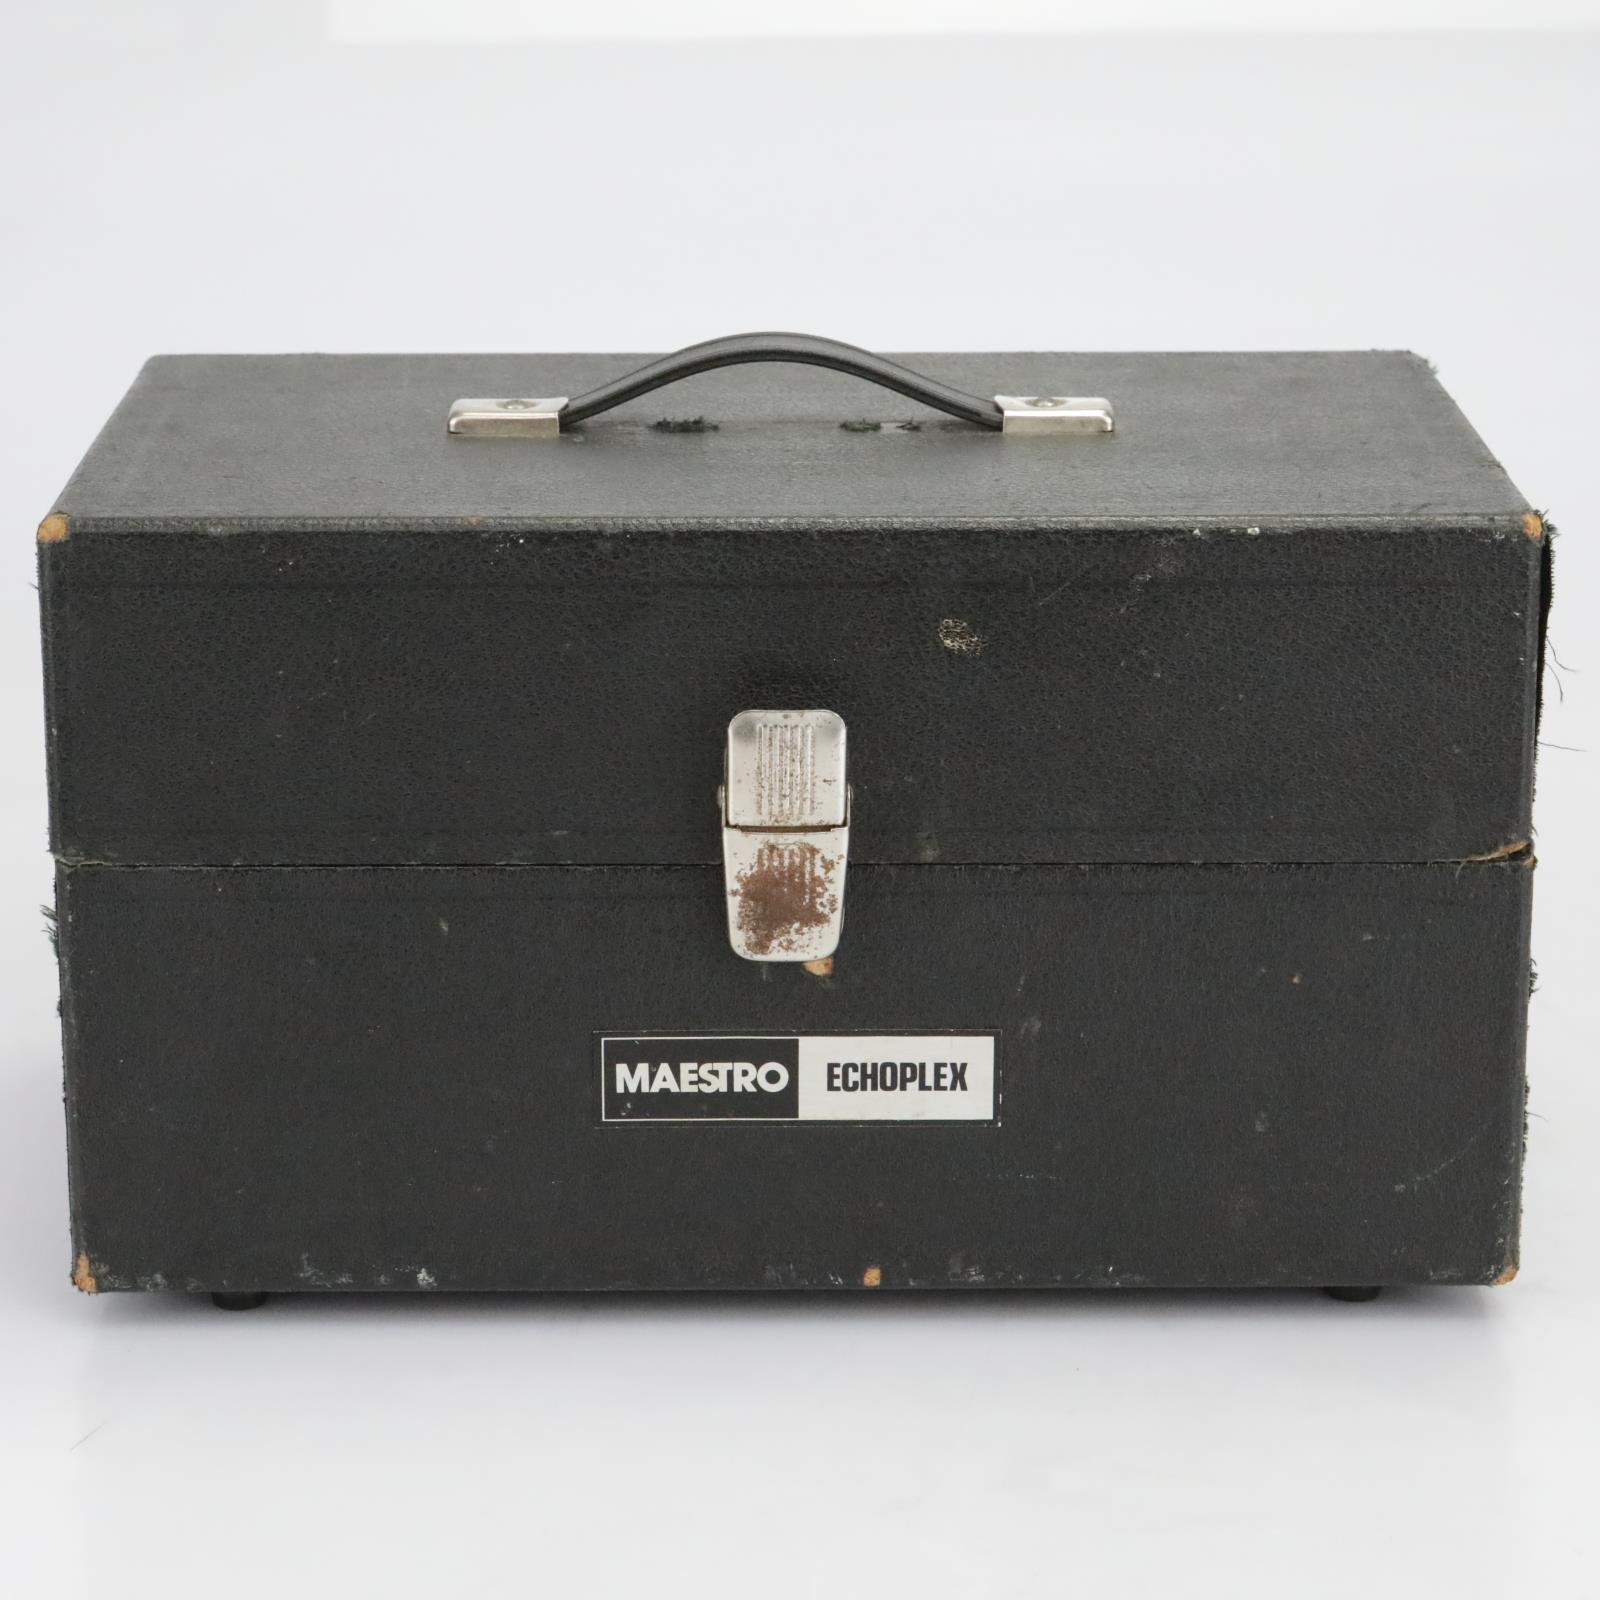 Maestro Echoplex Analog Tape Delay Unit #40301